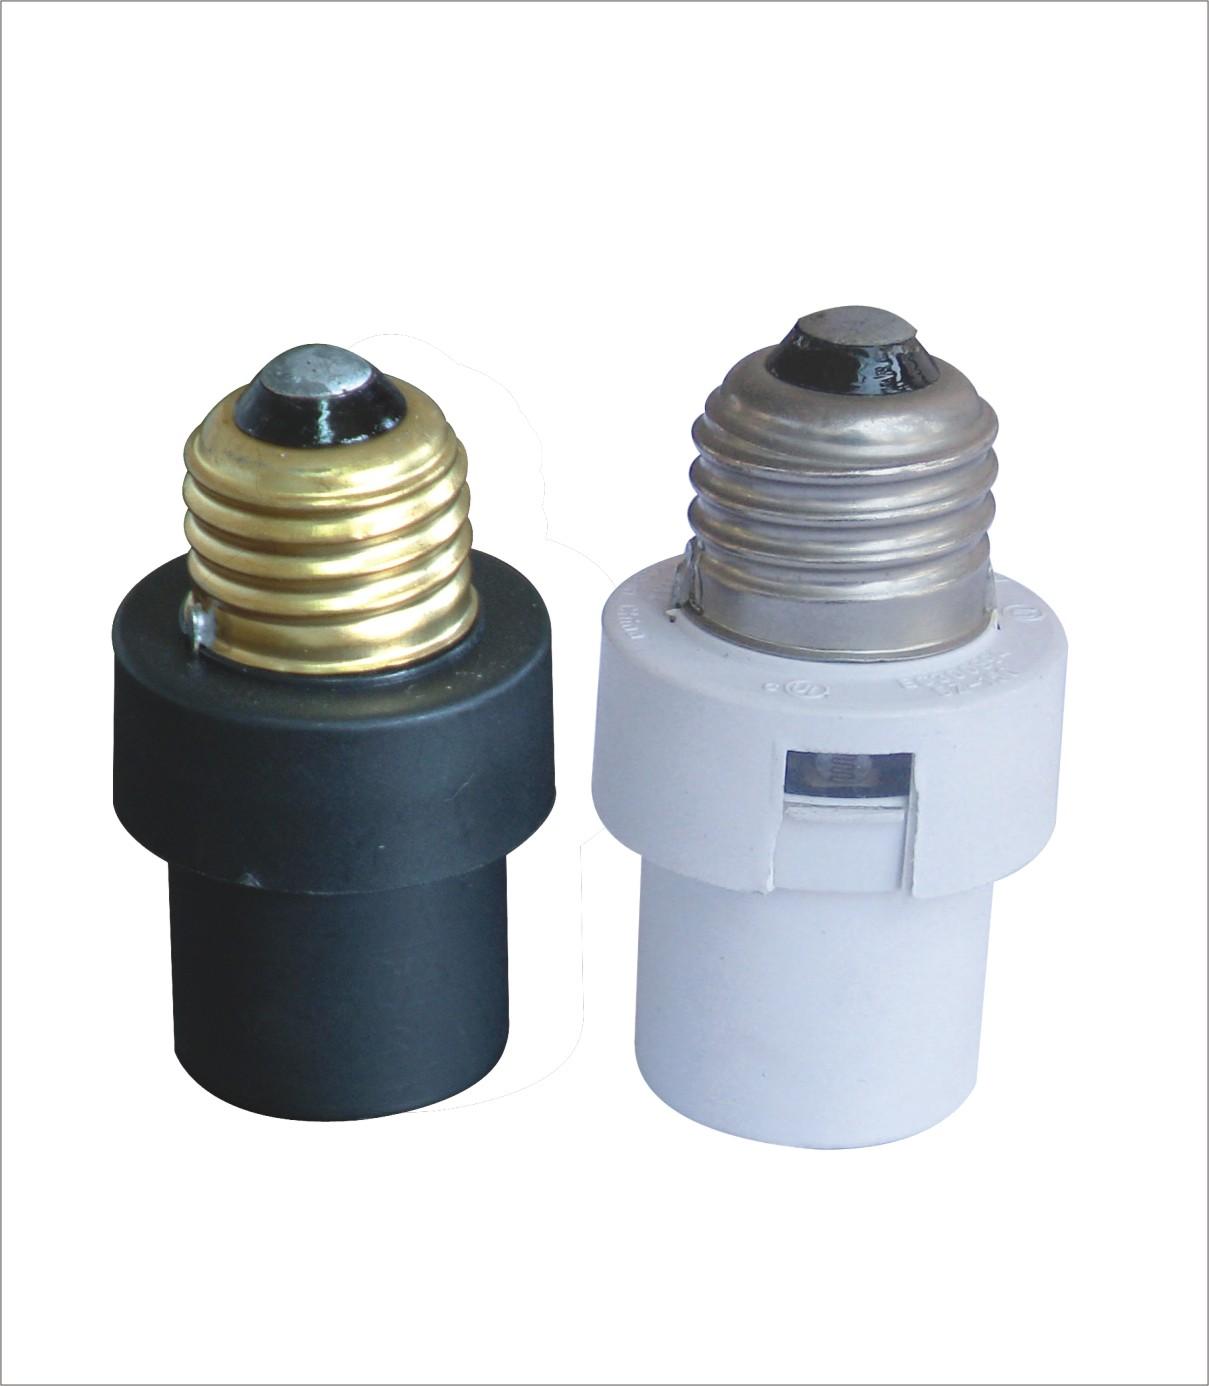 e26 outdoor motion light sensor switch bulb socket lamp. Black Bedroom Furniture Sets. Home Design Ideas